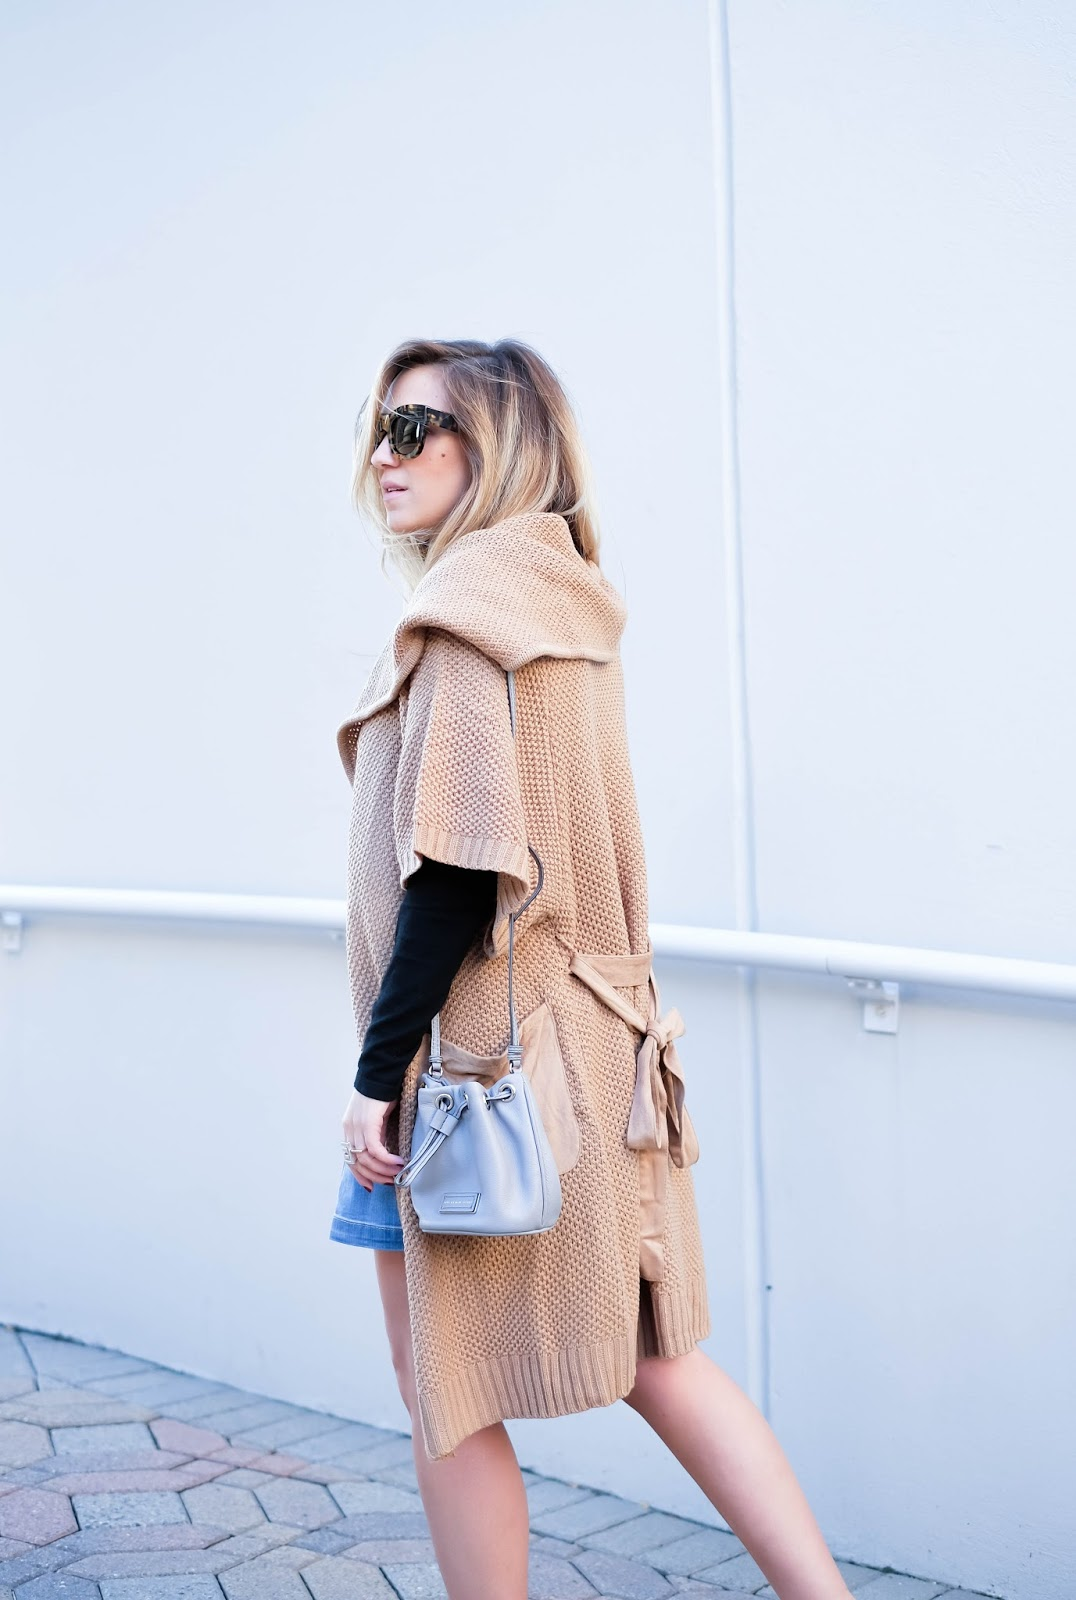 soho, Jennifer Hudson, jeans, new york company, denim, button, skirt, outfit